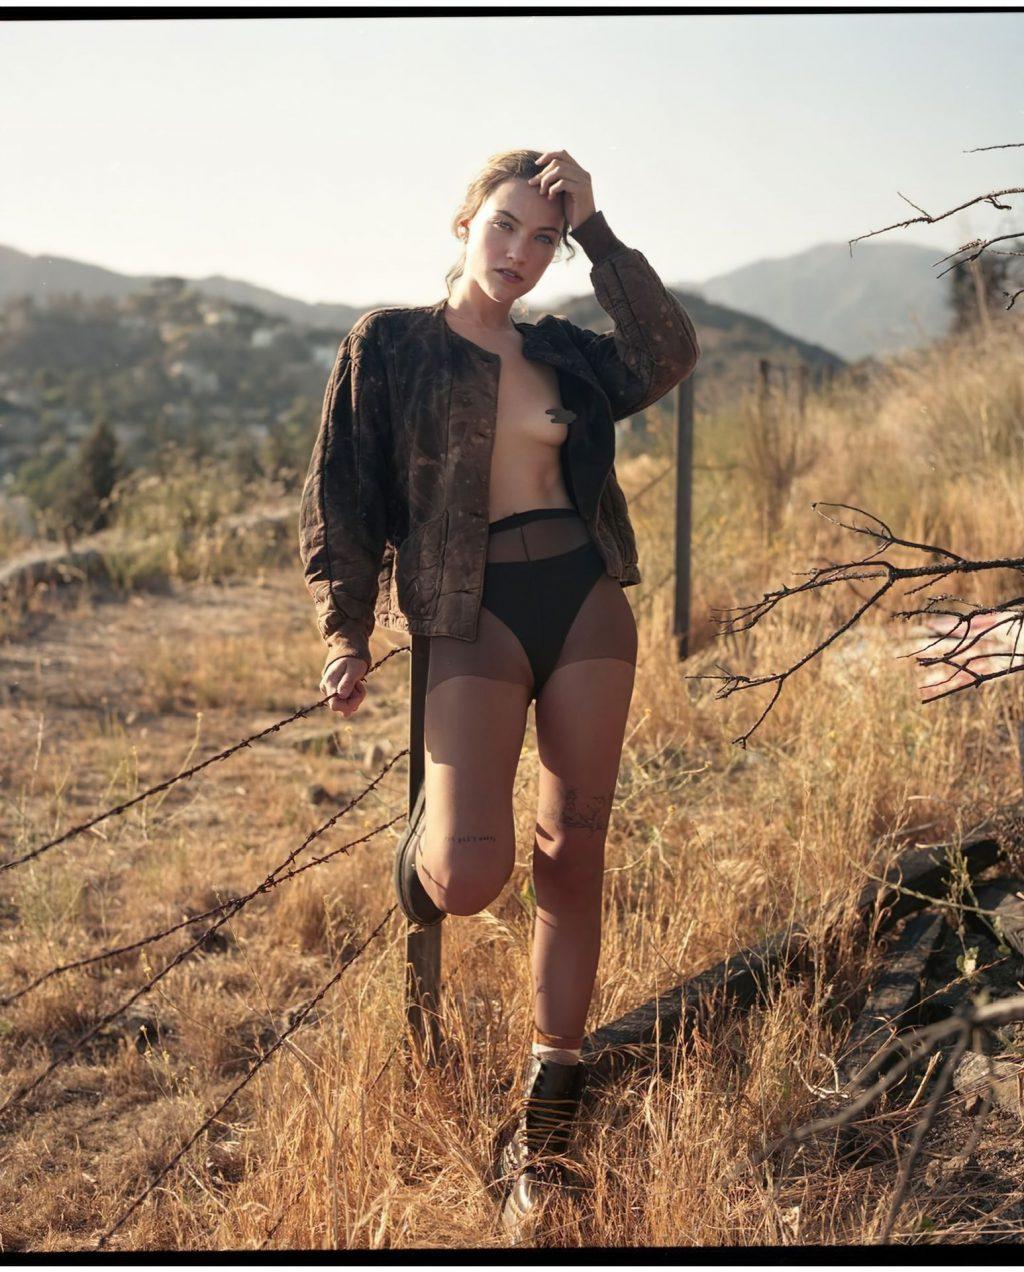 Violett Beane Nude (23 Photos + Video)